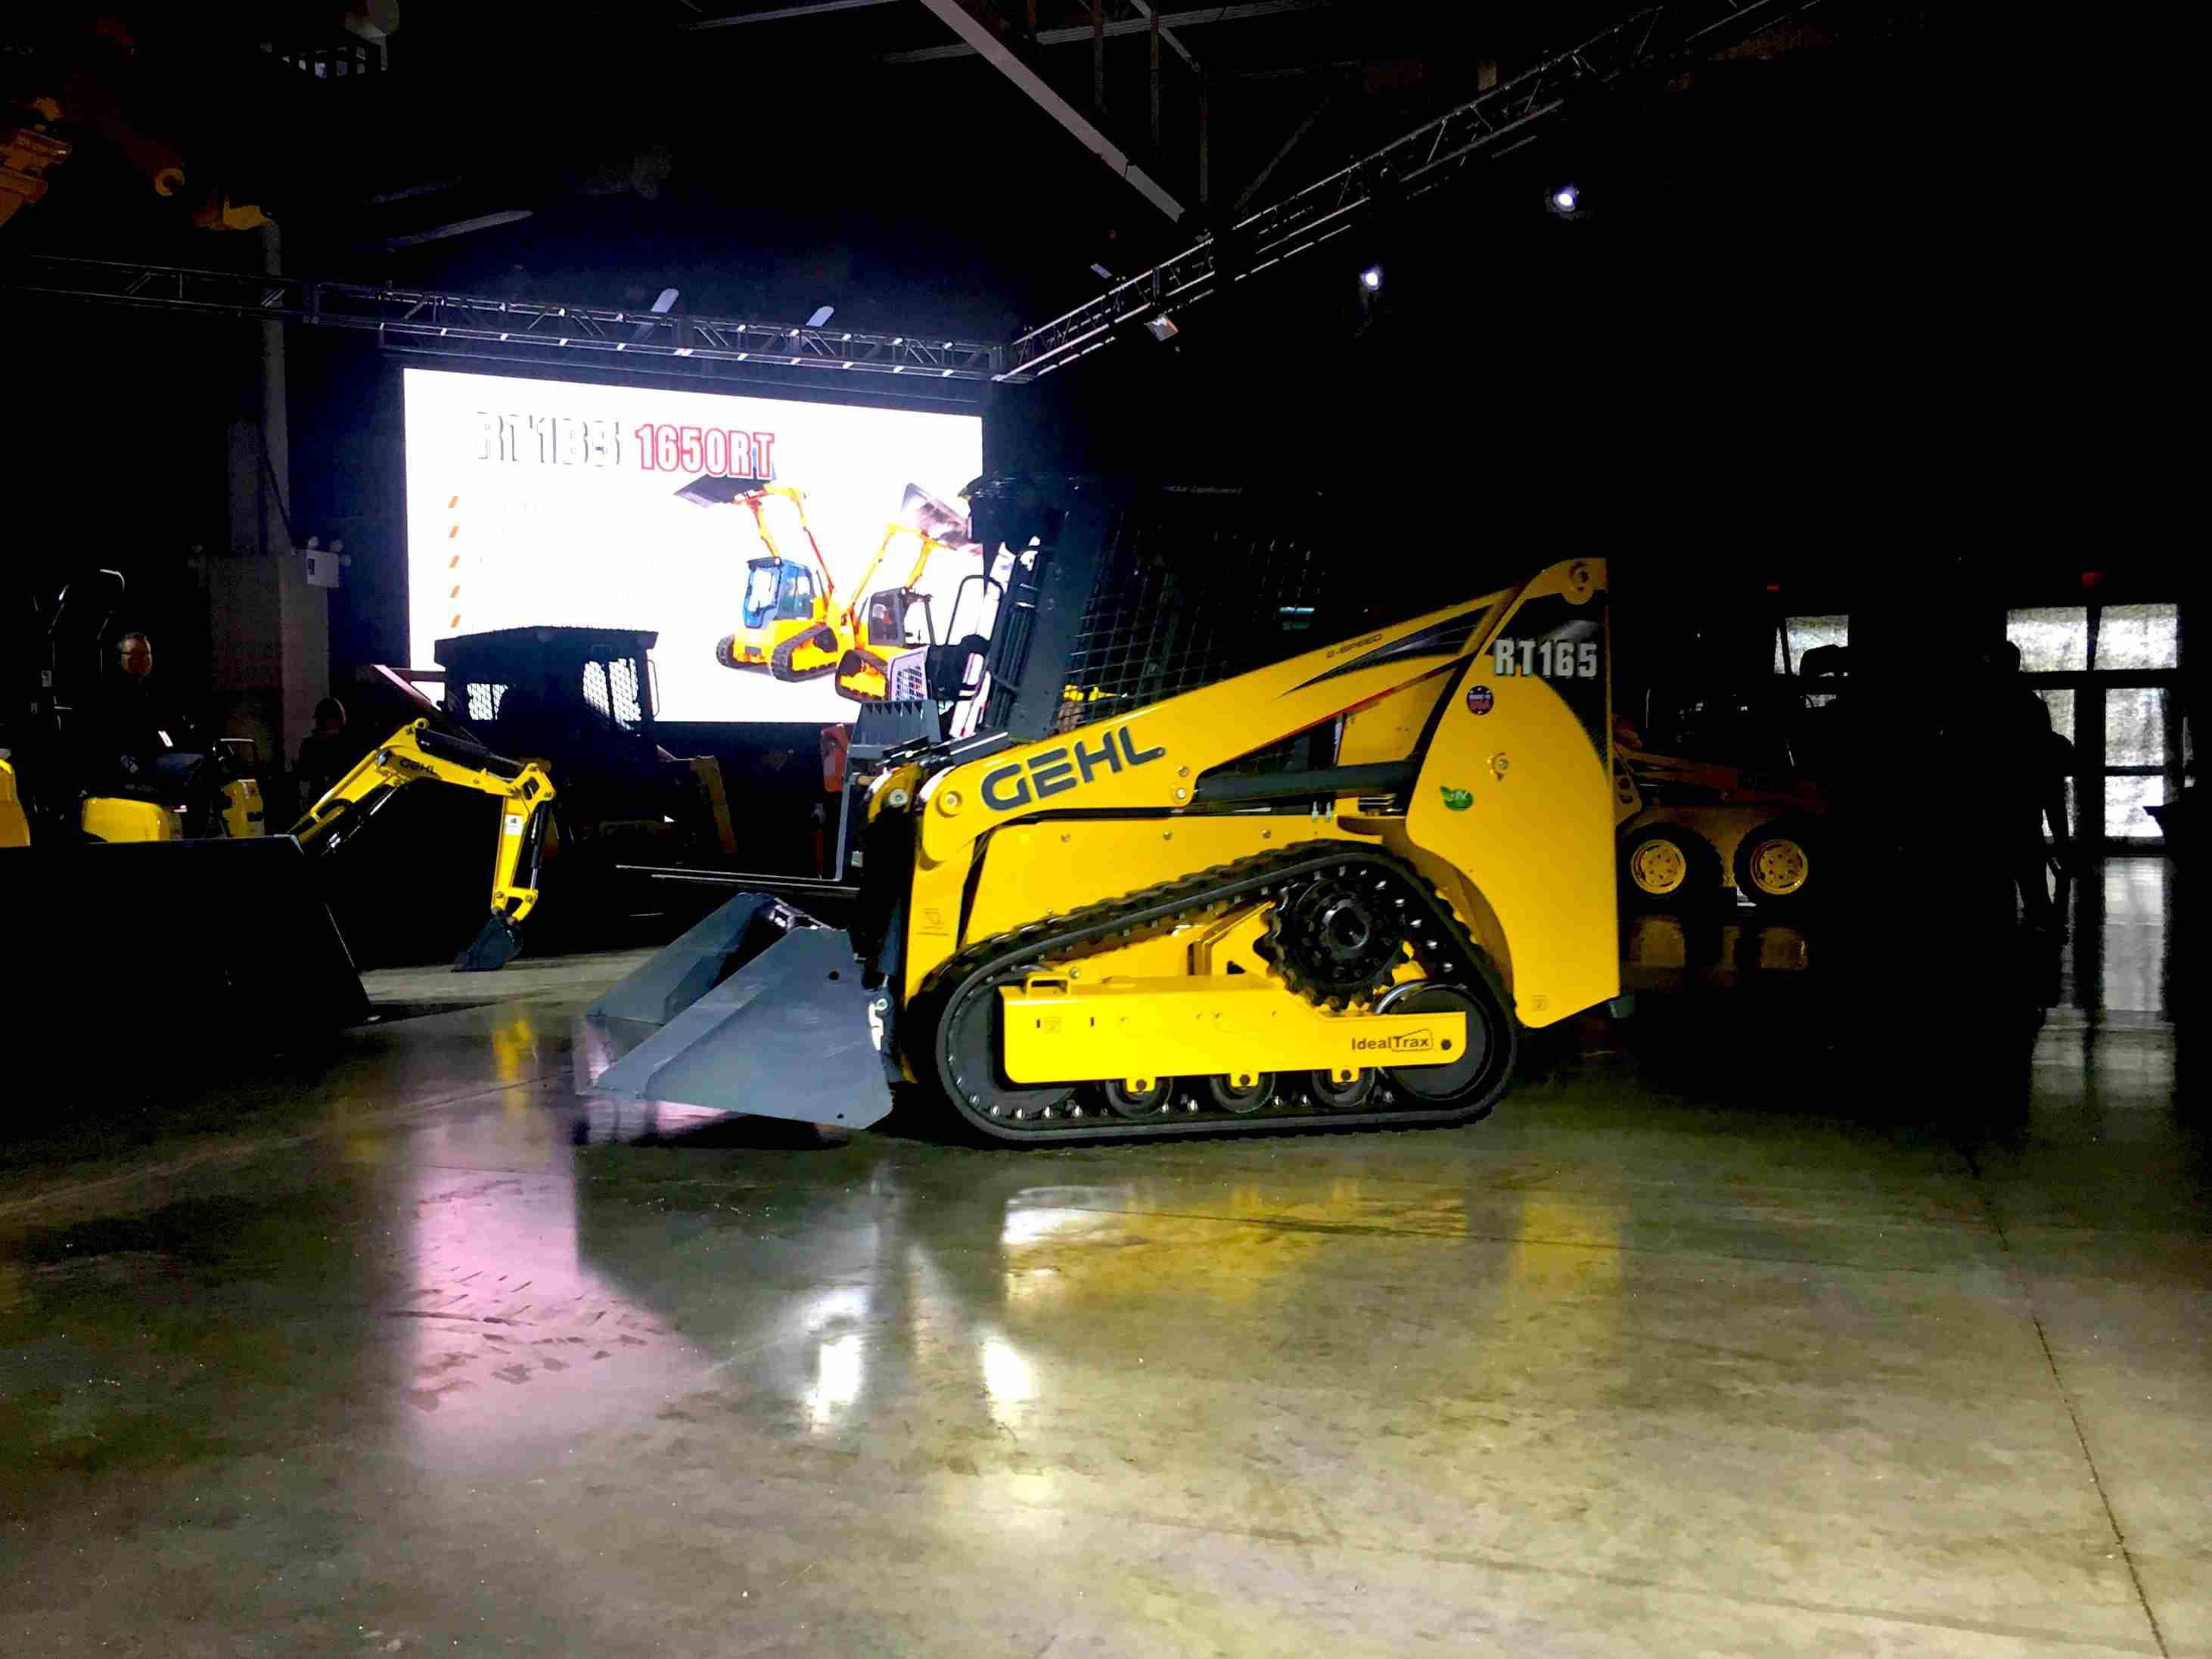 Gehl, Mustang introduce new track loader models